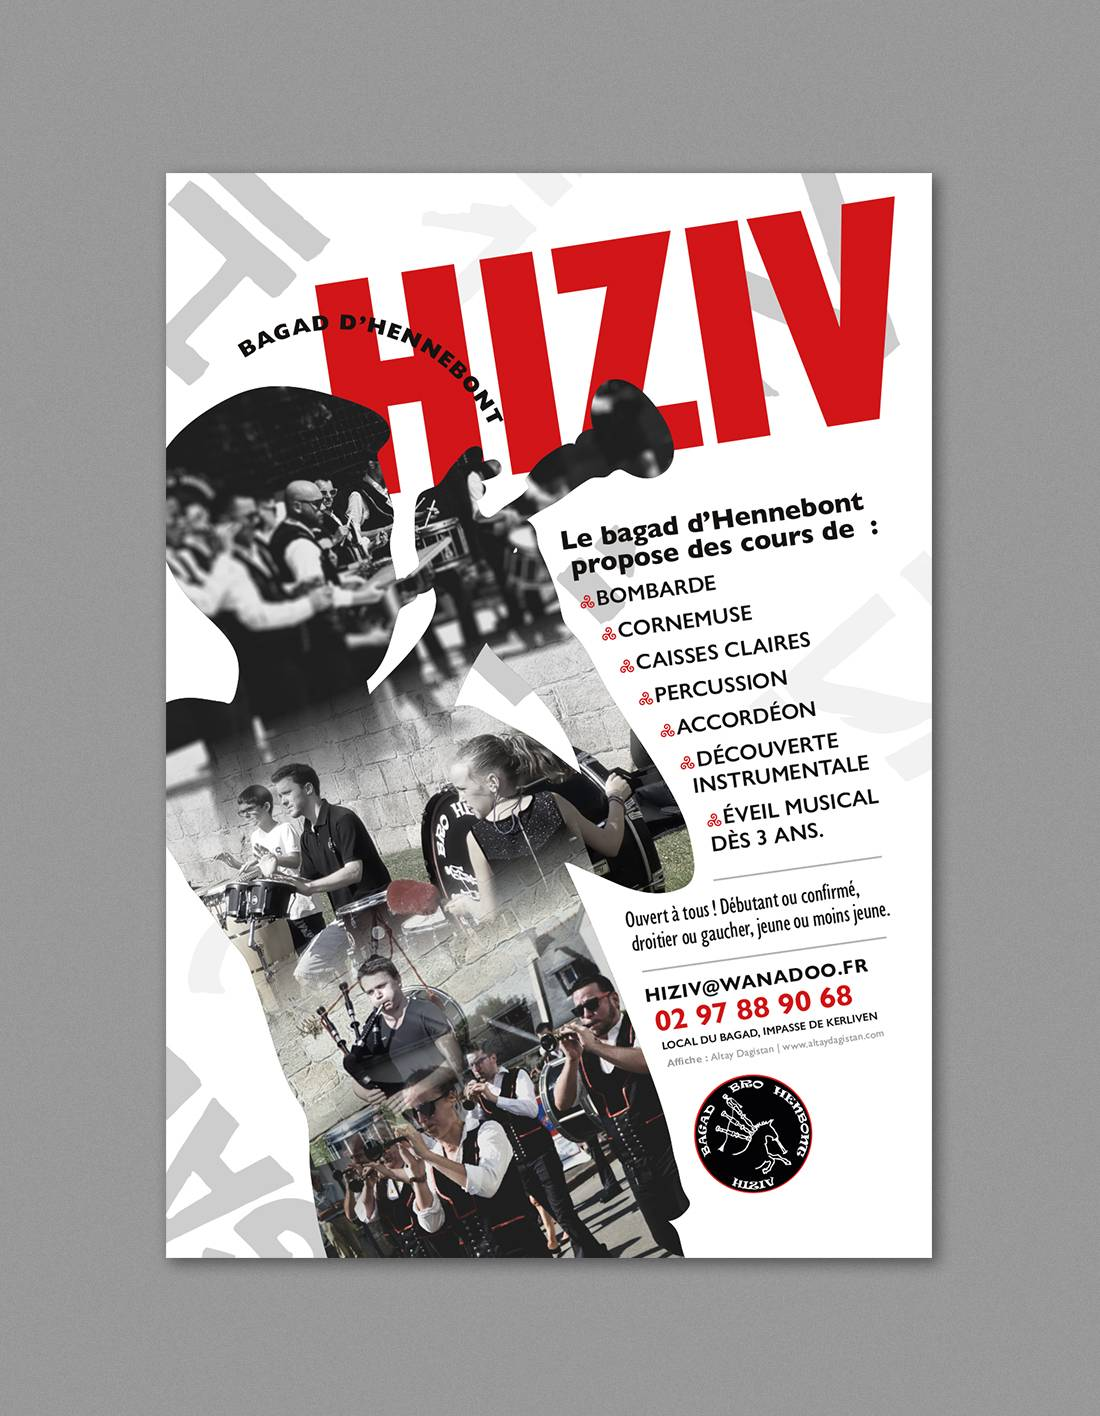 affiche design hiziv bagad breton